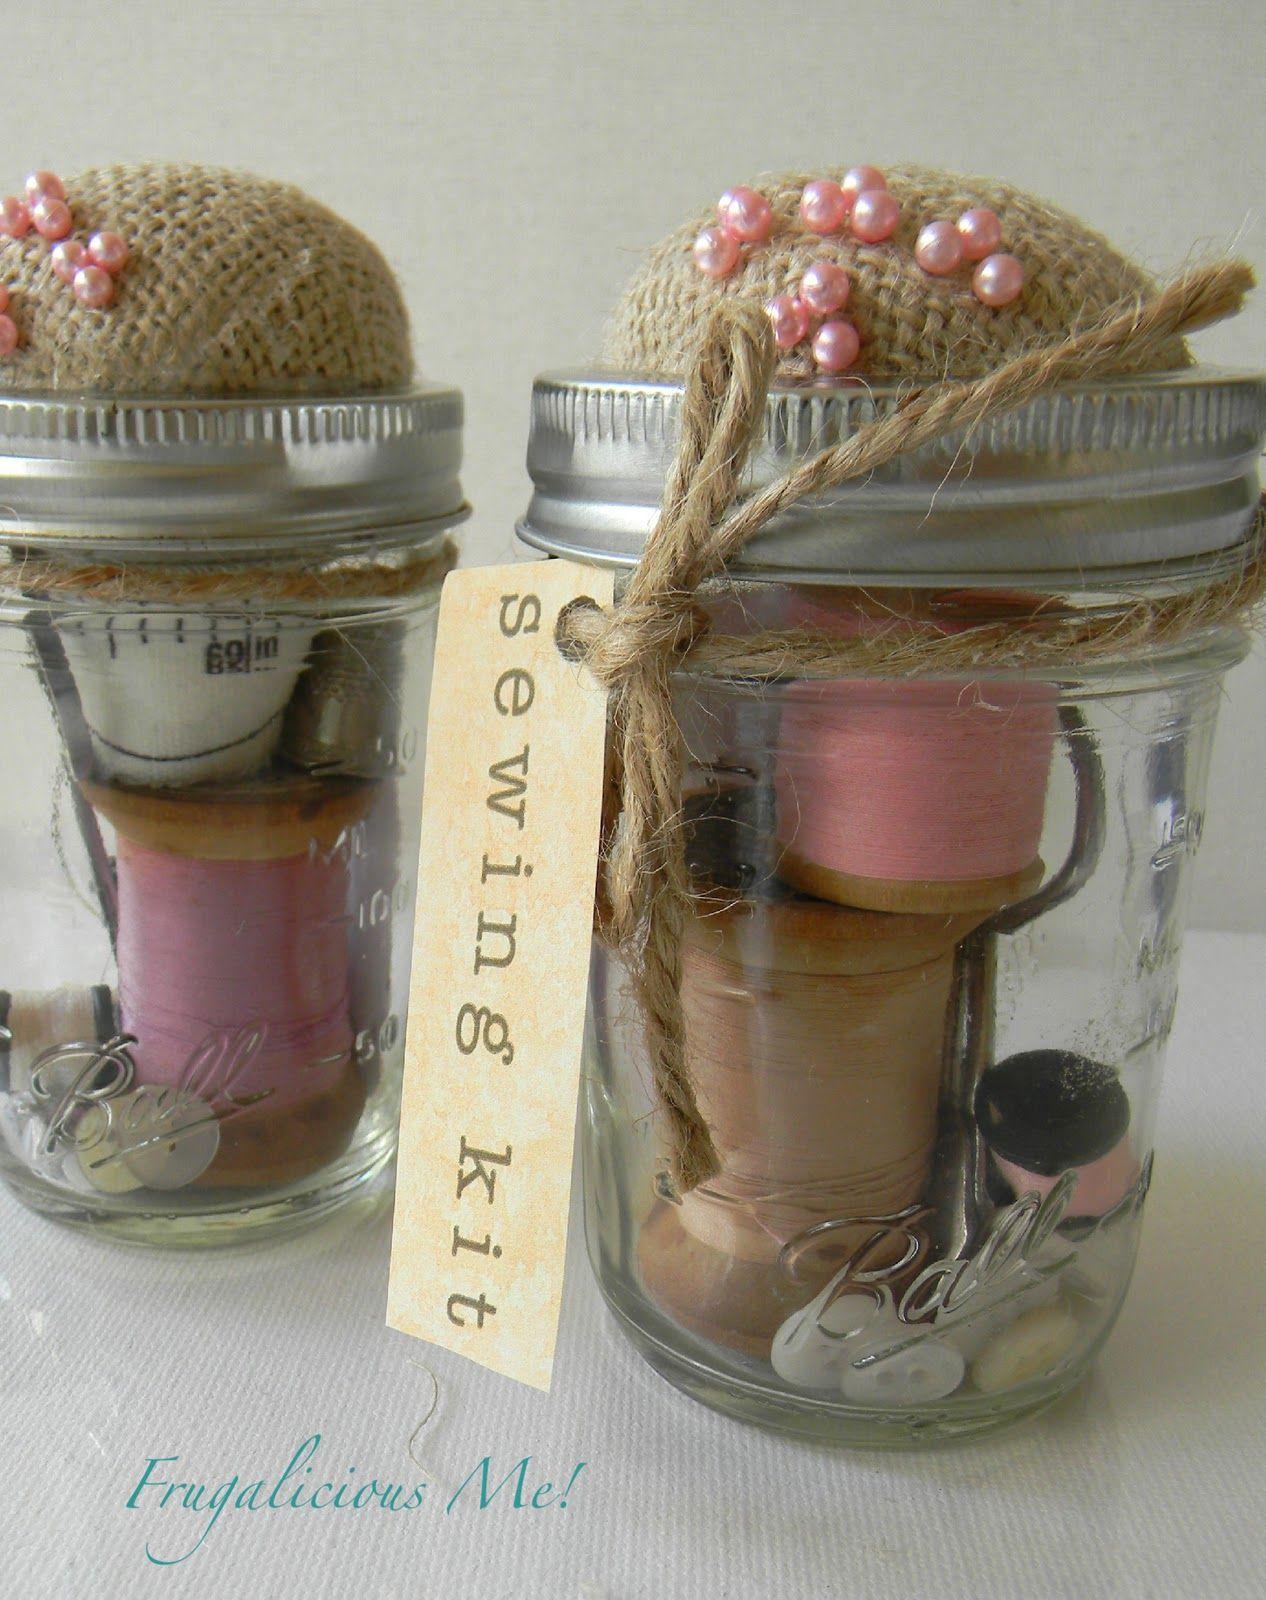 Craft Ideas | Craft Ideas | Pinterest | Jar, Tuesday and Craft